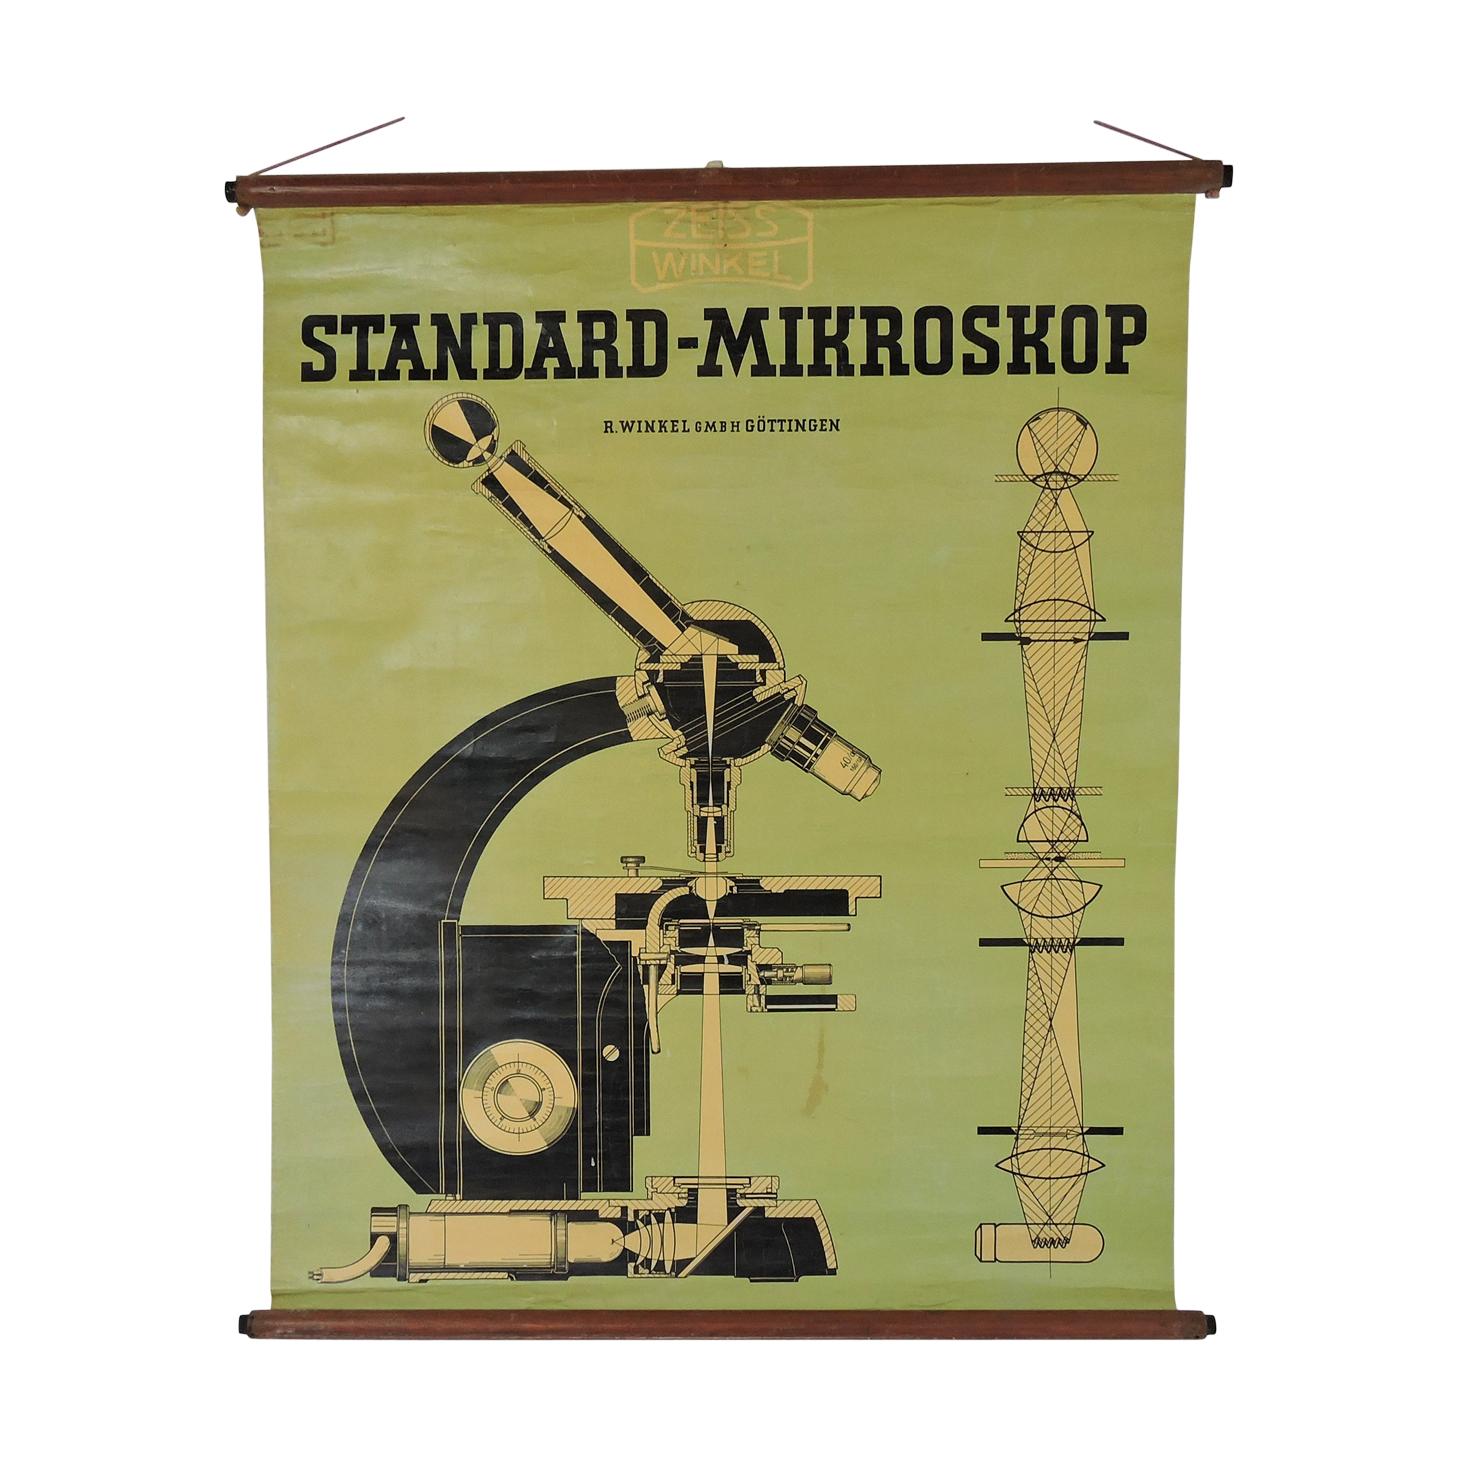 Affiche par Zeiss Winkel Standard-Mikroskope années 1940